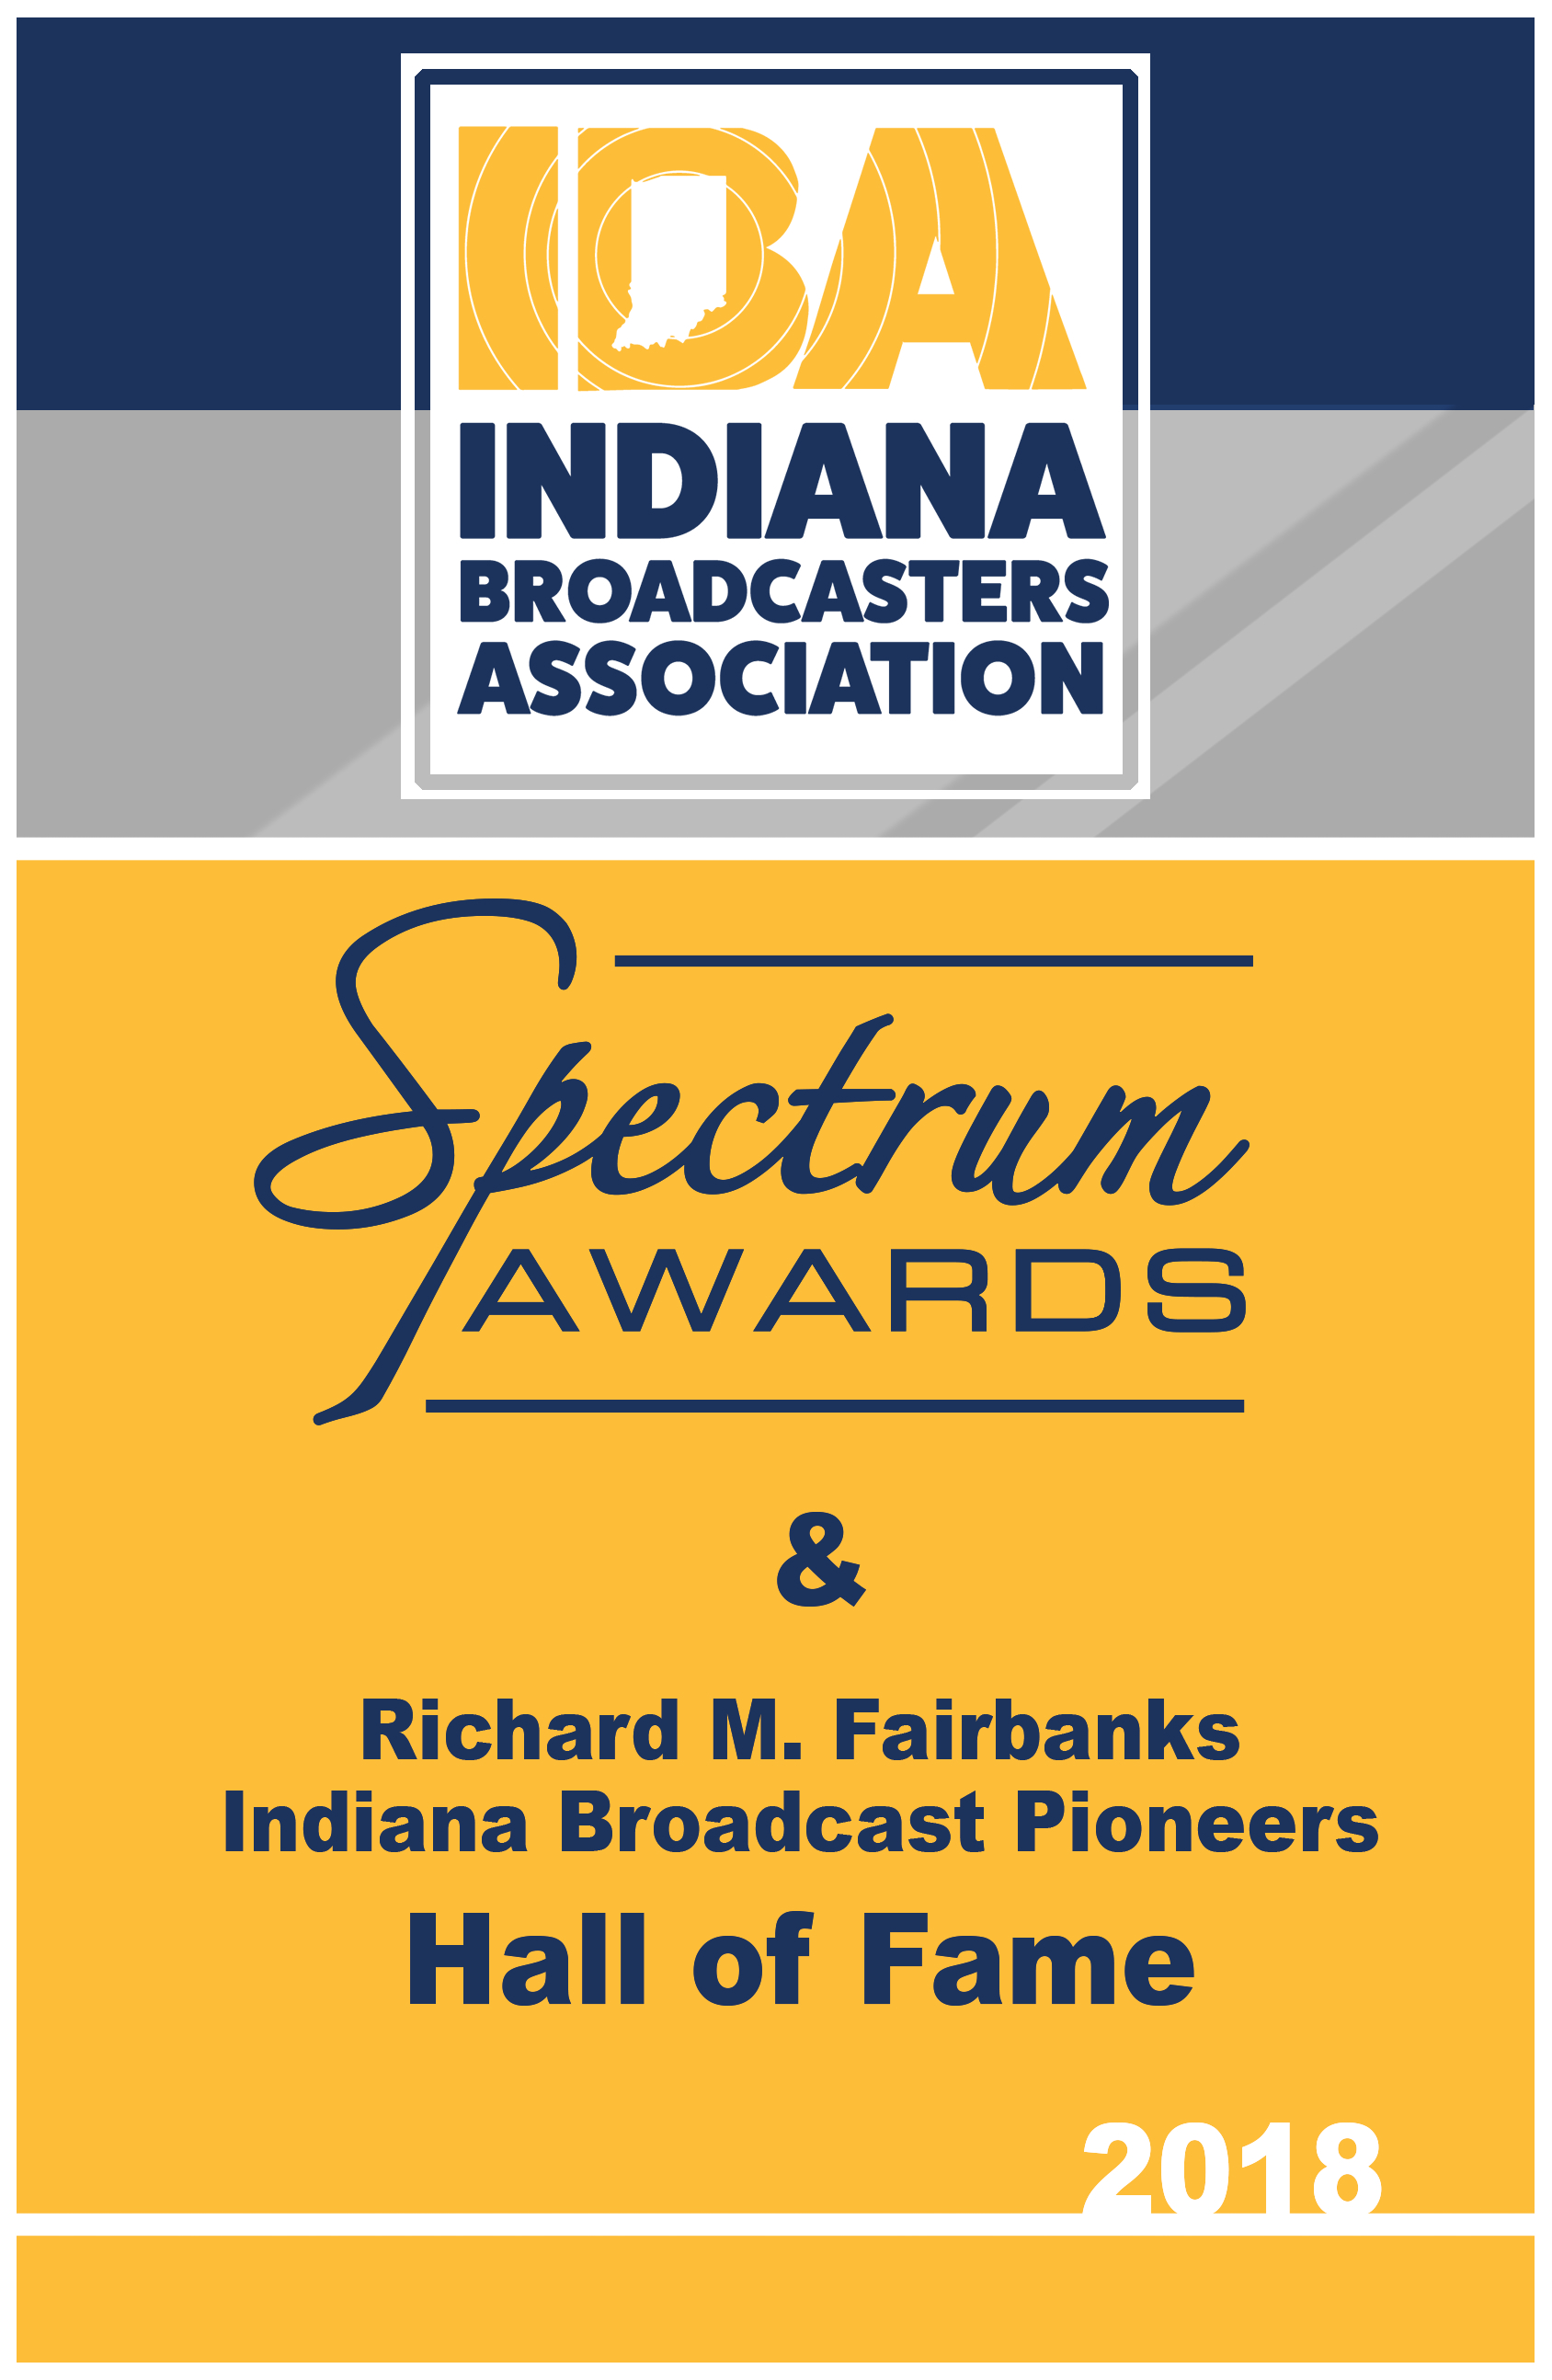 IBA Award Cover